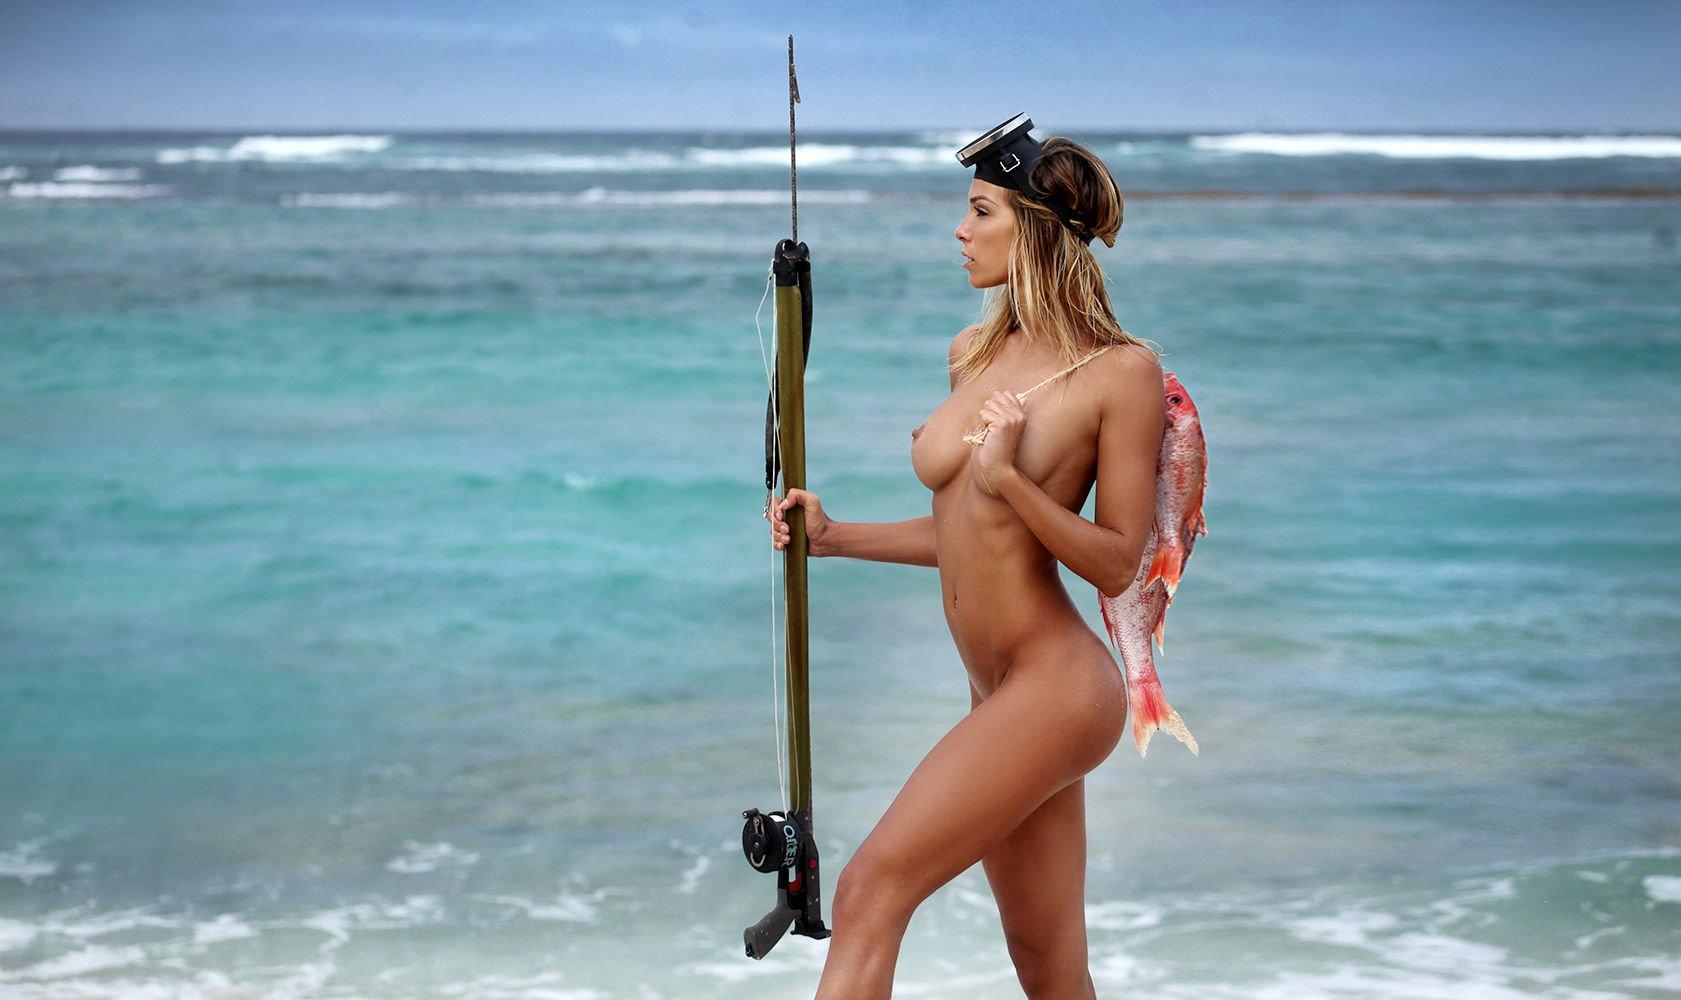 Fishing pics